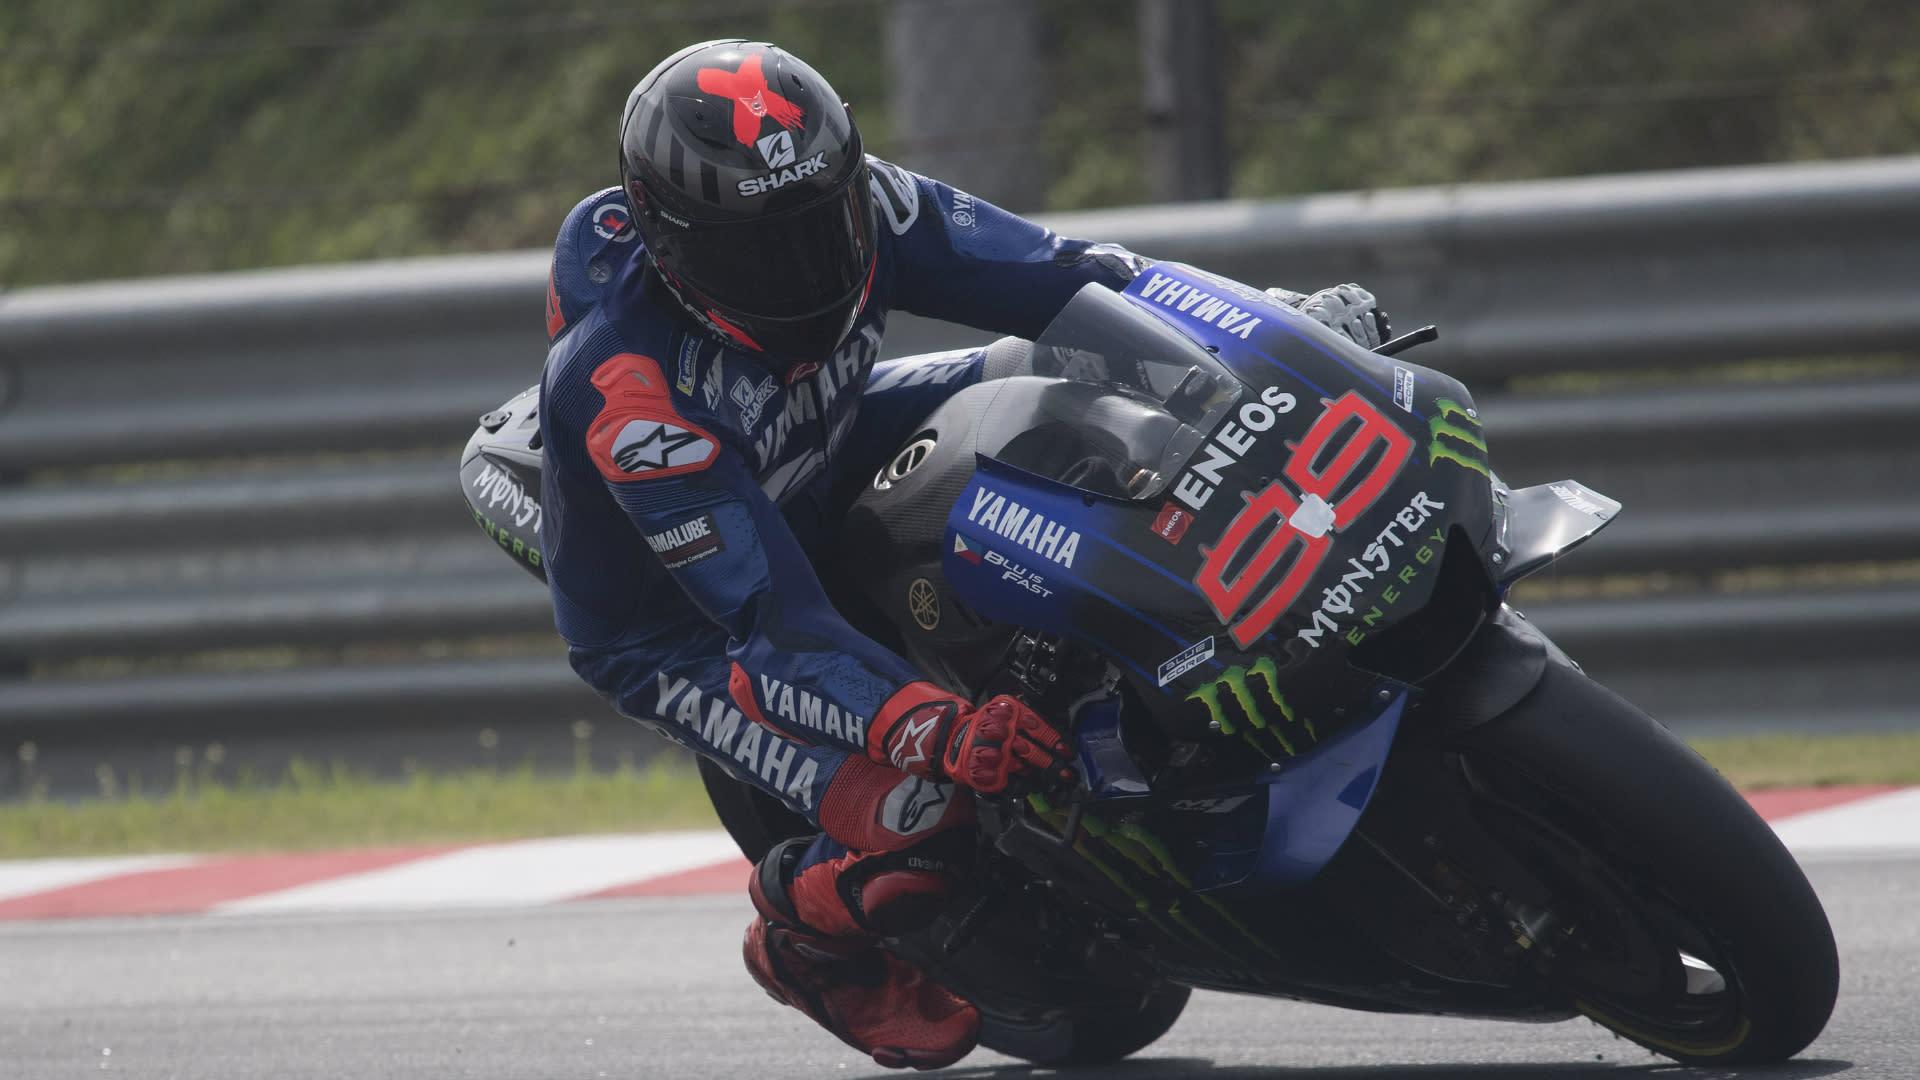 Motogp 2020 Rossi And Quartararo Question Yamaha Over Underused Lorenzo